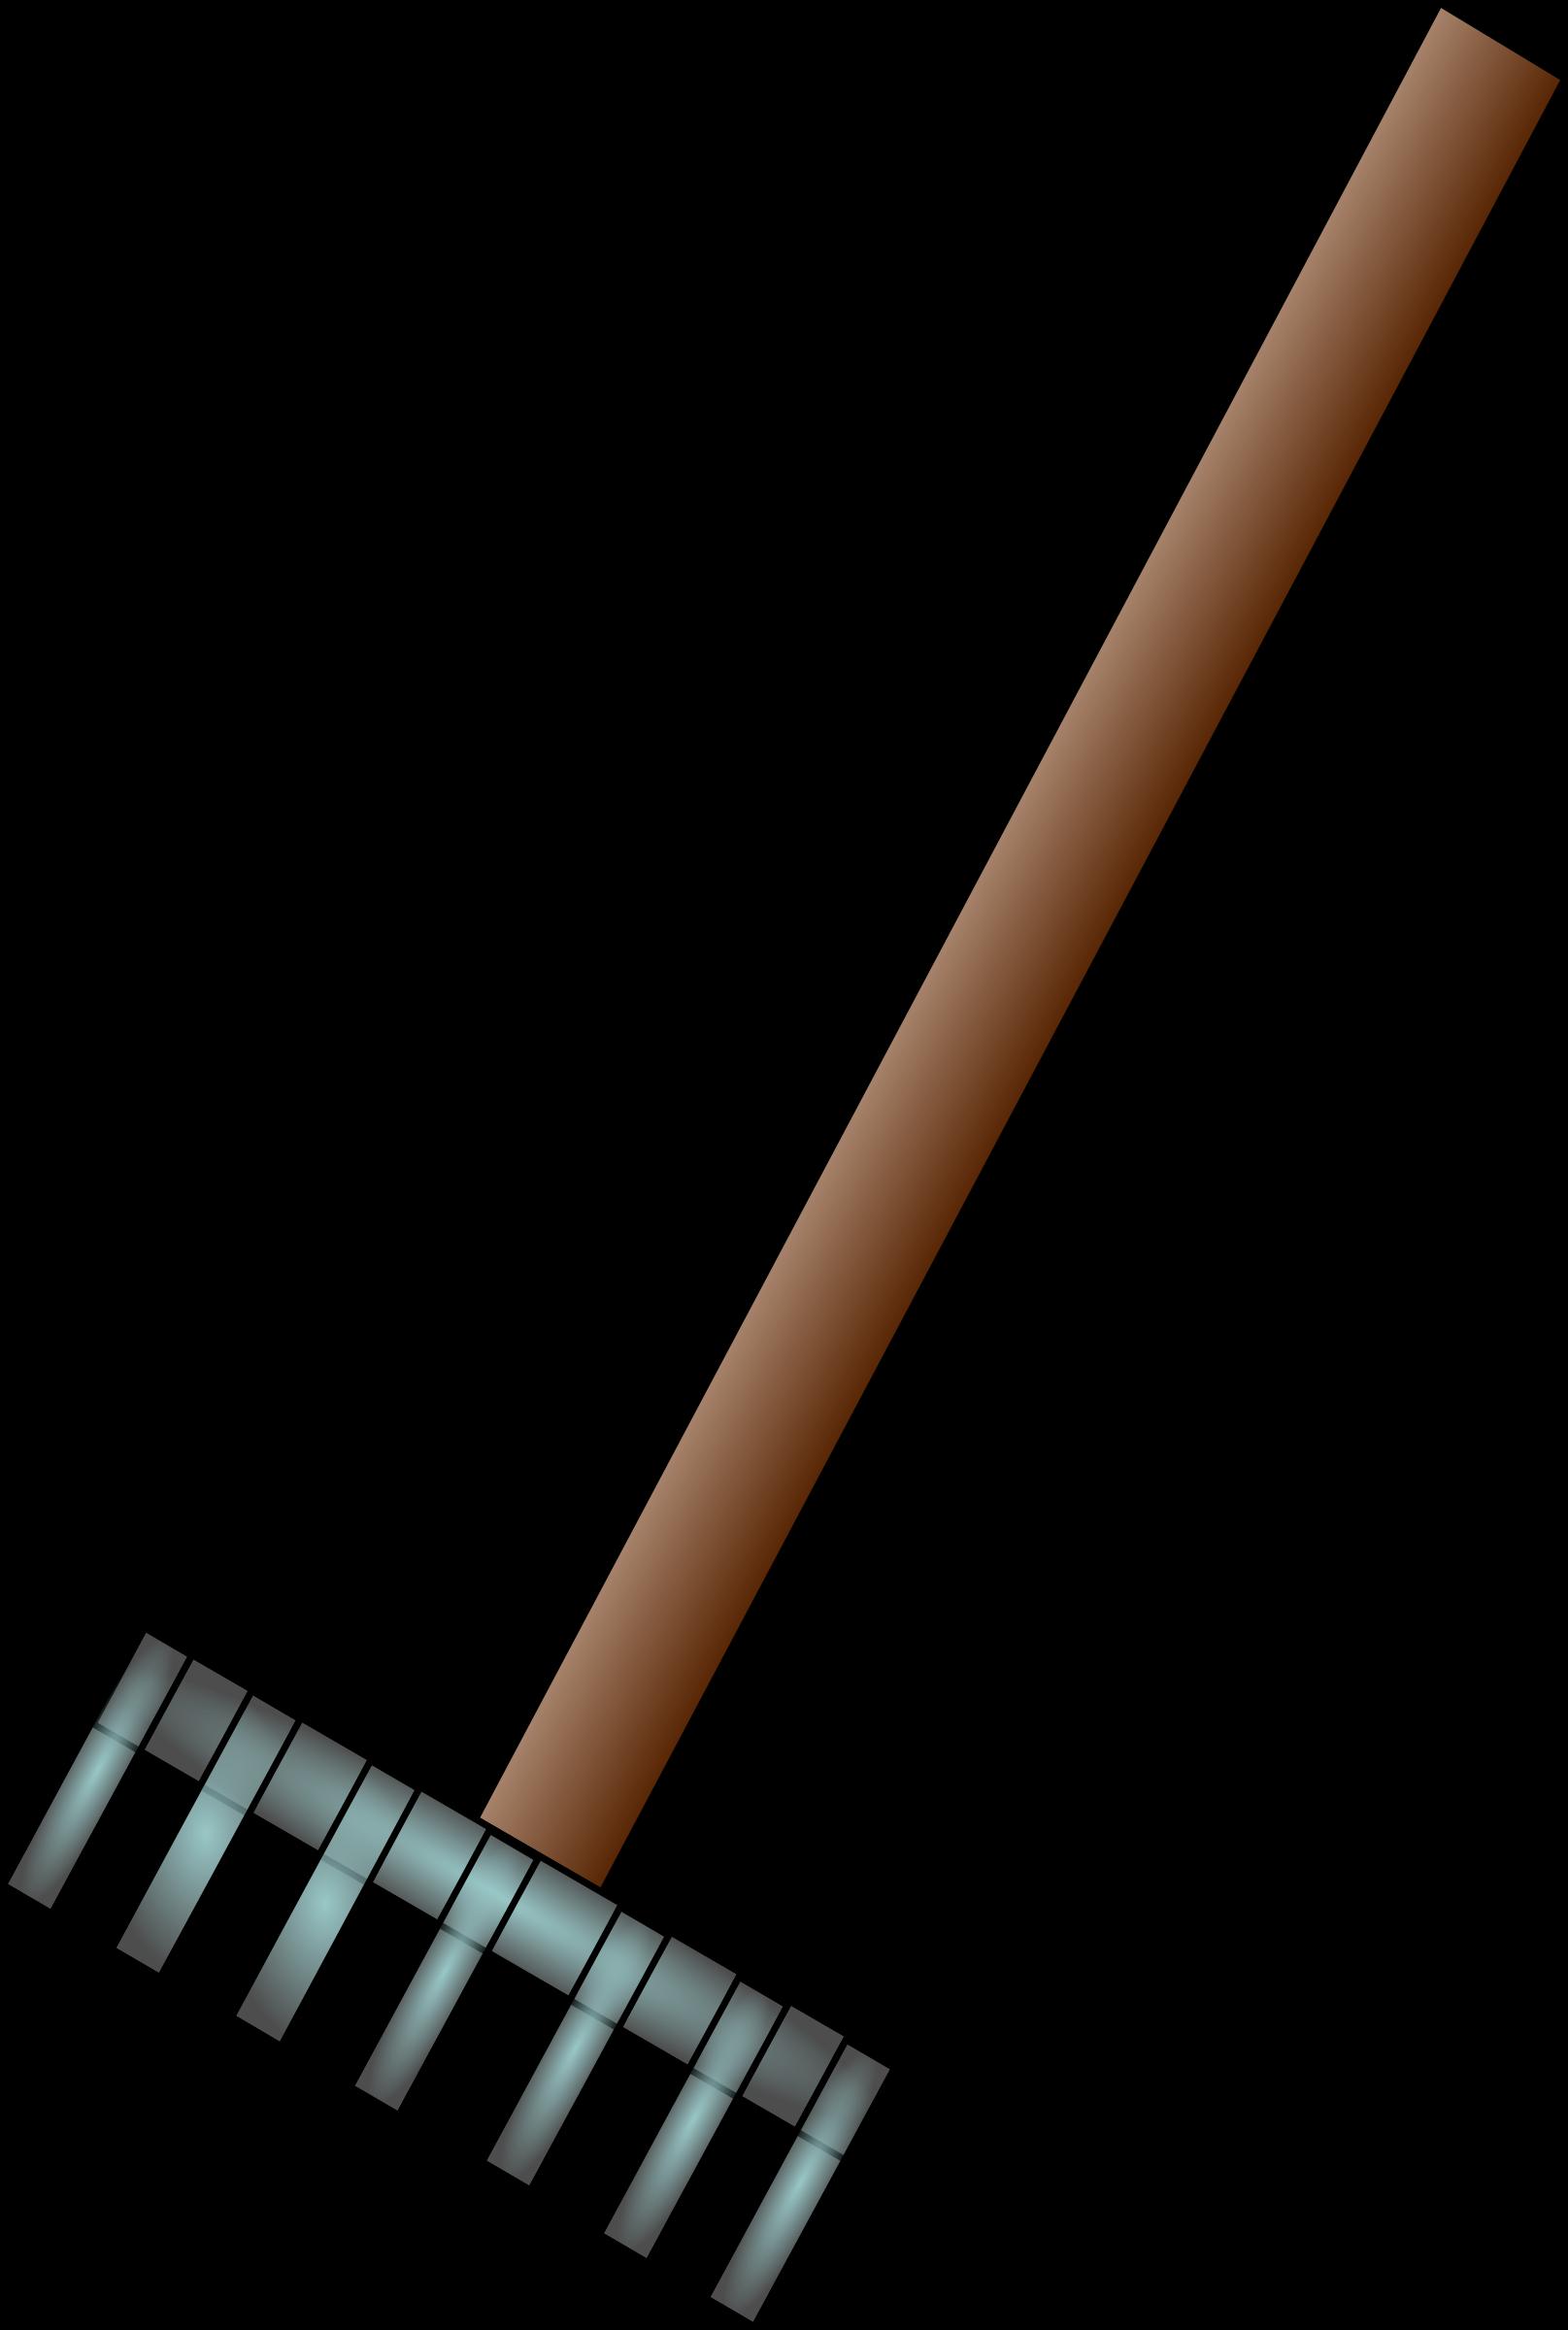 Gardener clipart garden rake. Big image png